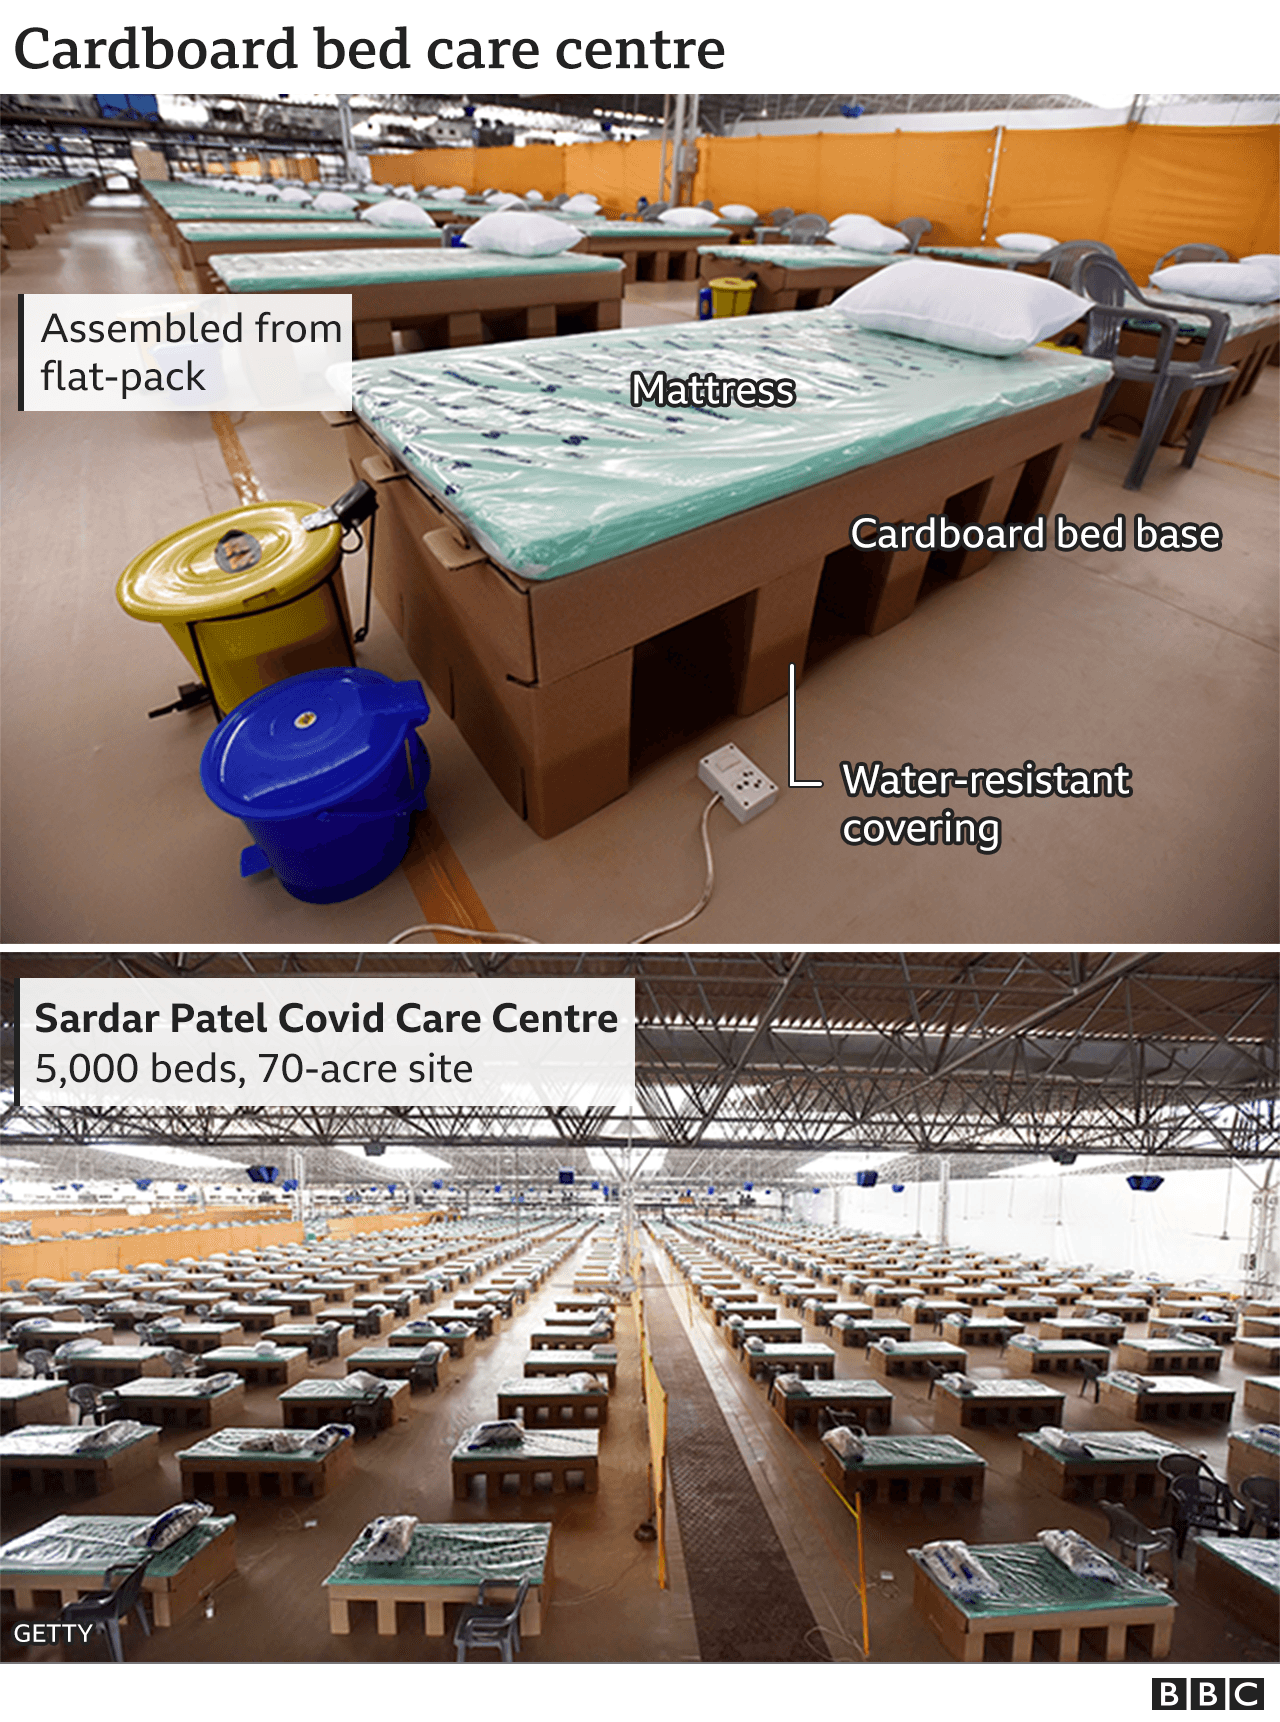 Cardboard beds at the Sardar Patel Covid Care Centre